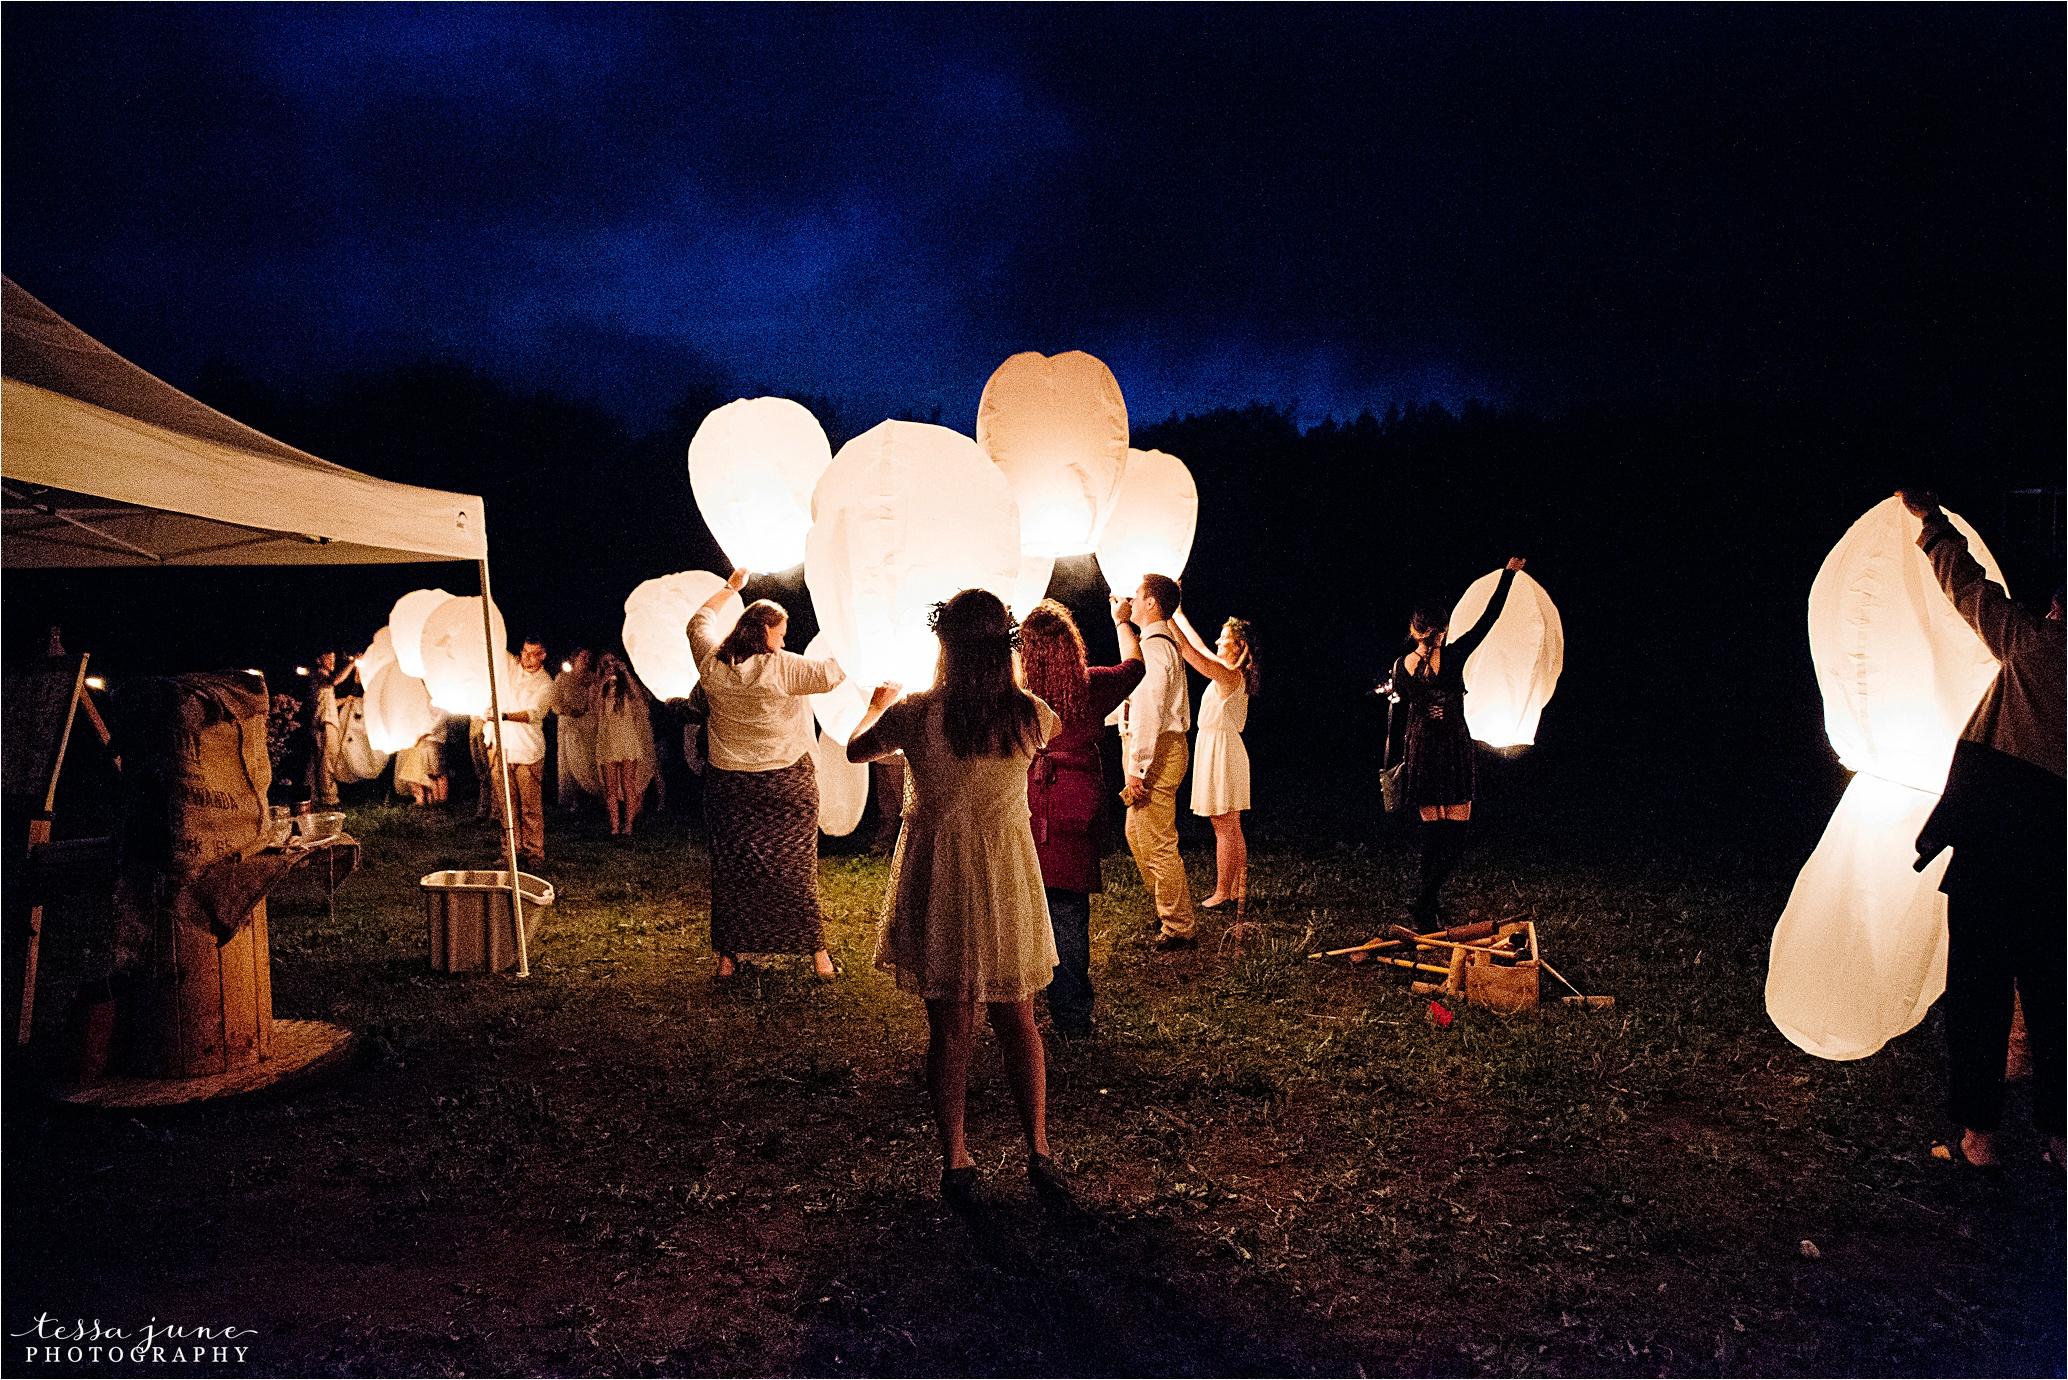 bohemian-forest-wedding-stillwater-minnesota-flower-crown-st-cloud-photographer-lantern-sendoff